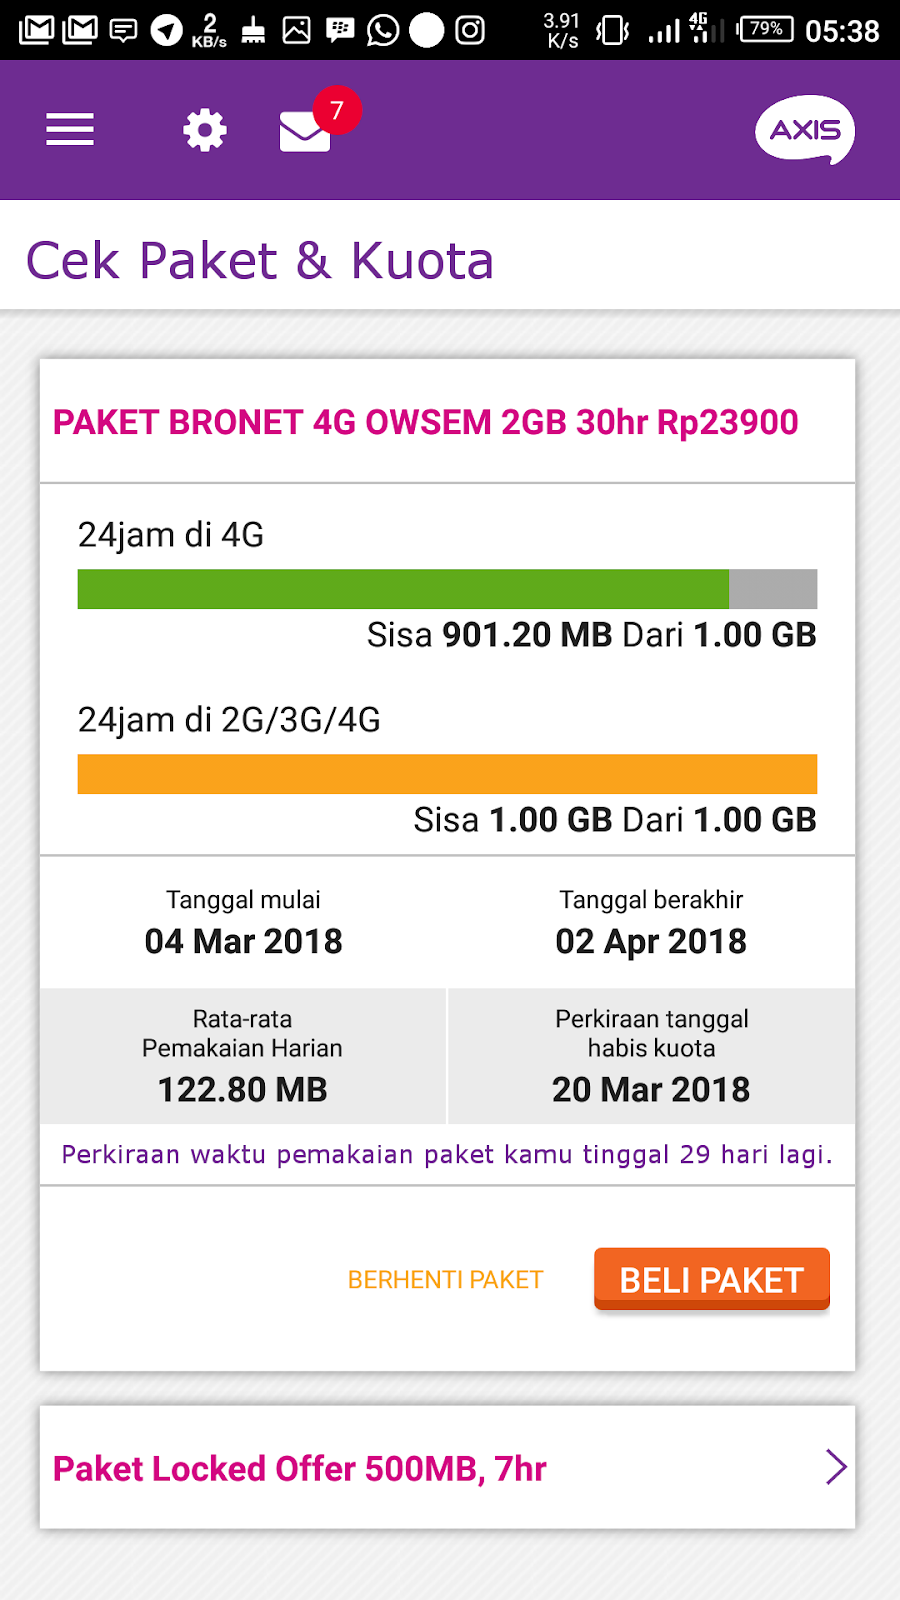 Pengalaman Upgrade Kartu 4g Axis Di Xl Center Paket Internet Bronet Owsem